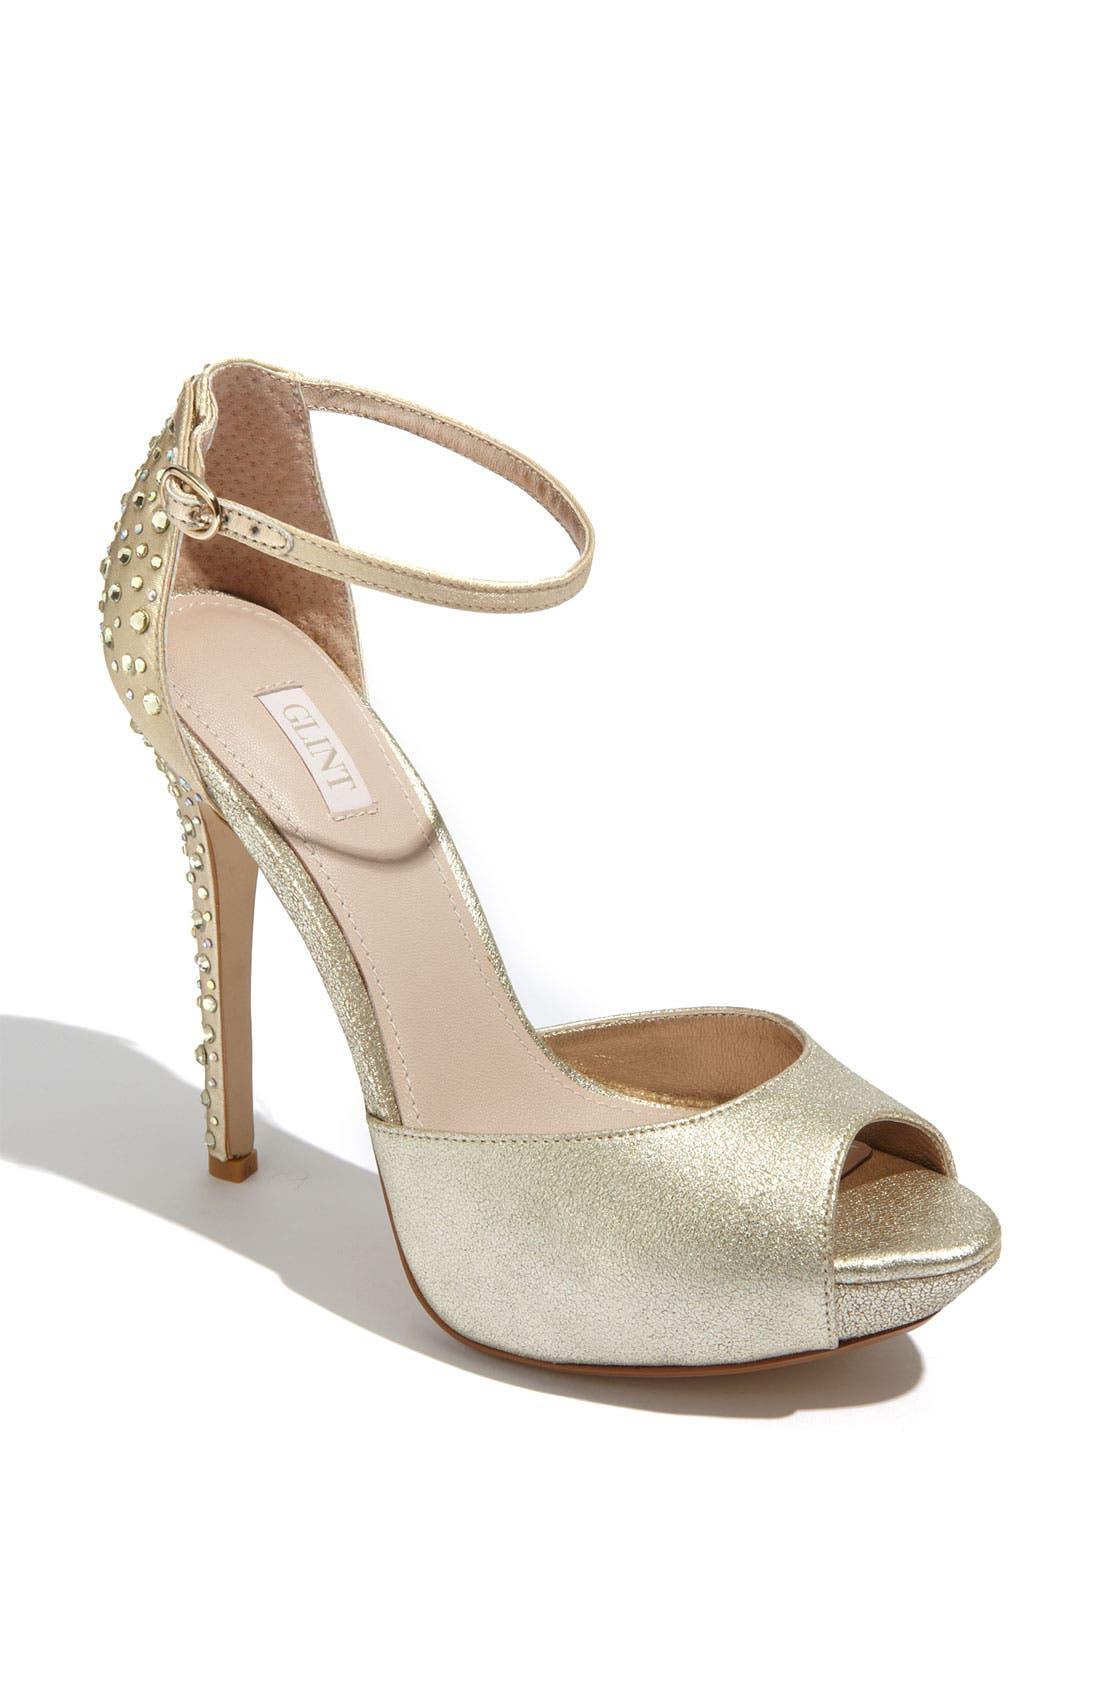 Alternate Image 1 Selected - Glint 'Viola' Jeweled Sandal